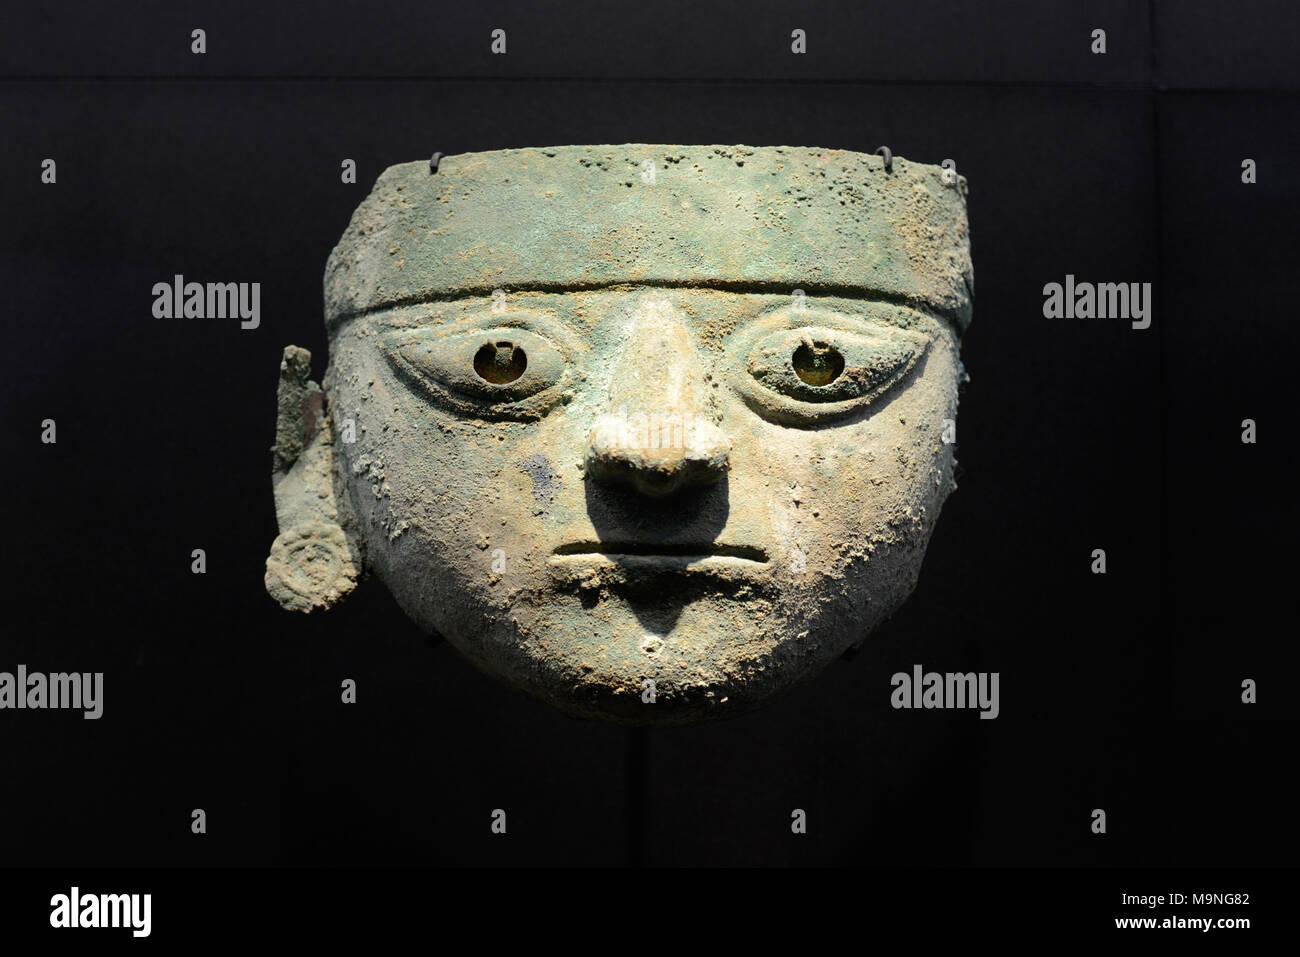 Silver and Copper Funerary Mask (350-60AD) from the Moche or Mochica Culture or Civilisation near Trujillo Peru - Stock Image